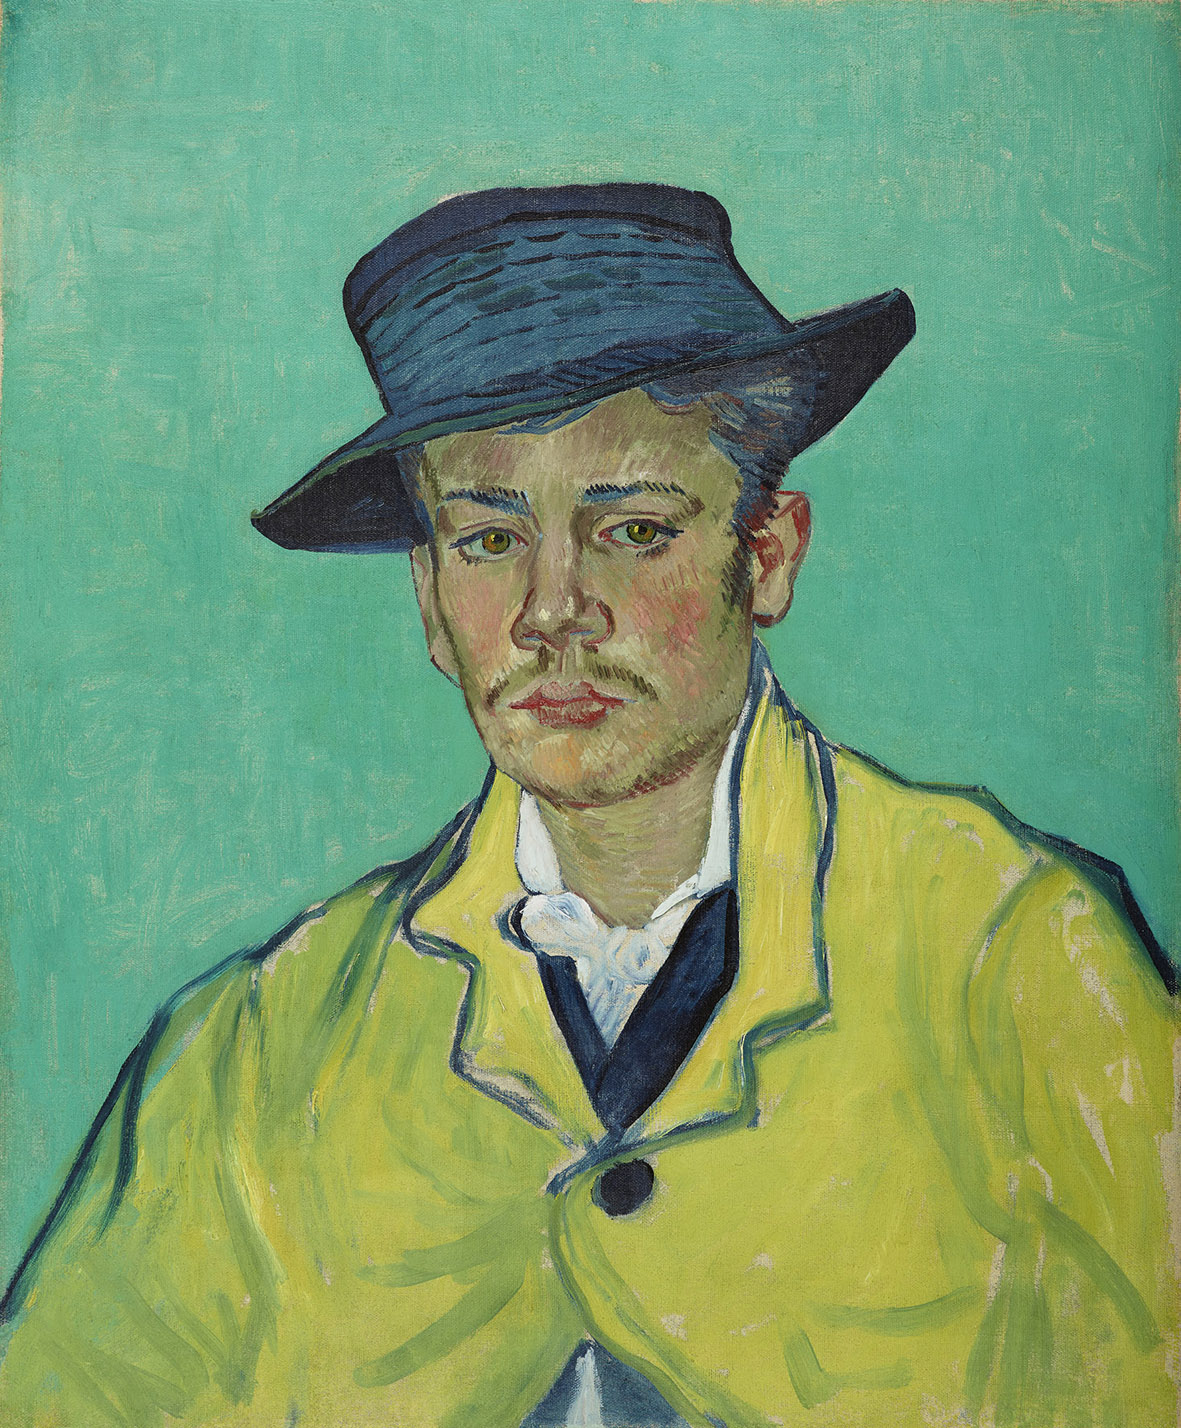 Vincent van Gogh: Ritratto di Armand Roulin, 1888, olio su tela, cm 65 x 54,1. Folkwang Museum, Essen trasferito dal Museum Folkwang, Hagen, nel 1922 © Jens Nober, Museum Folkwang